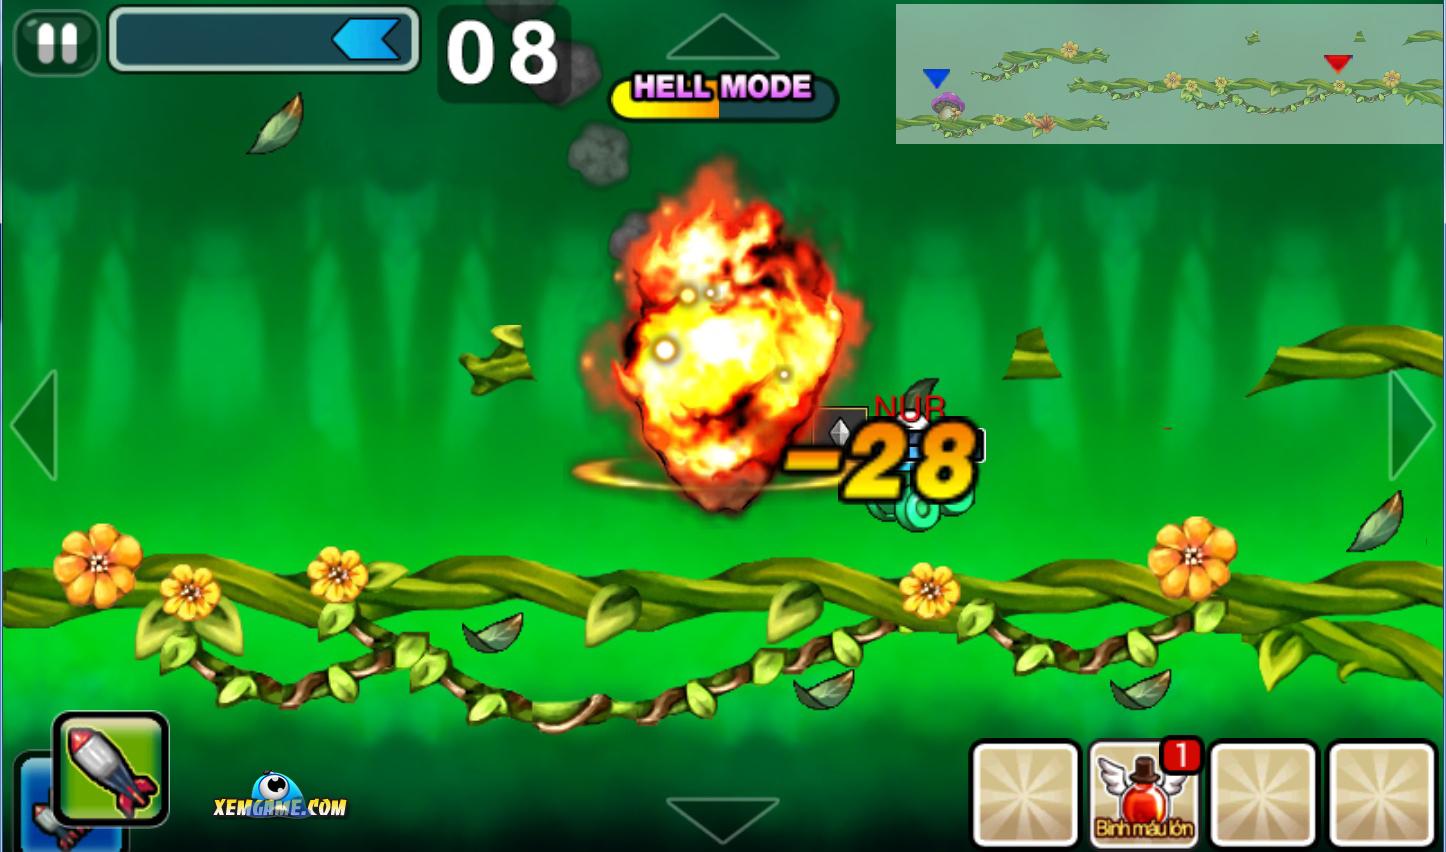 game-oppa_-tank-mobile-4.jpg (1446×852)